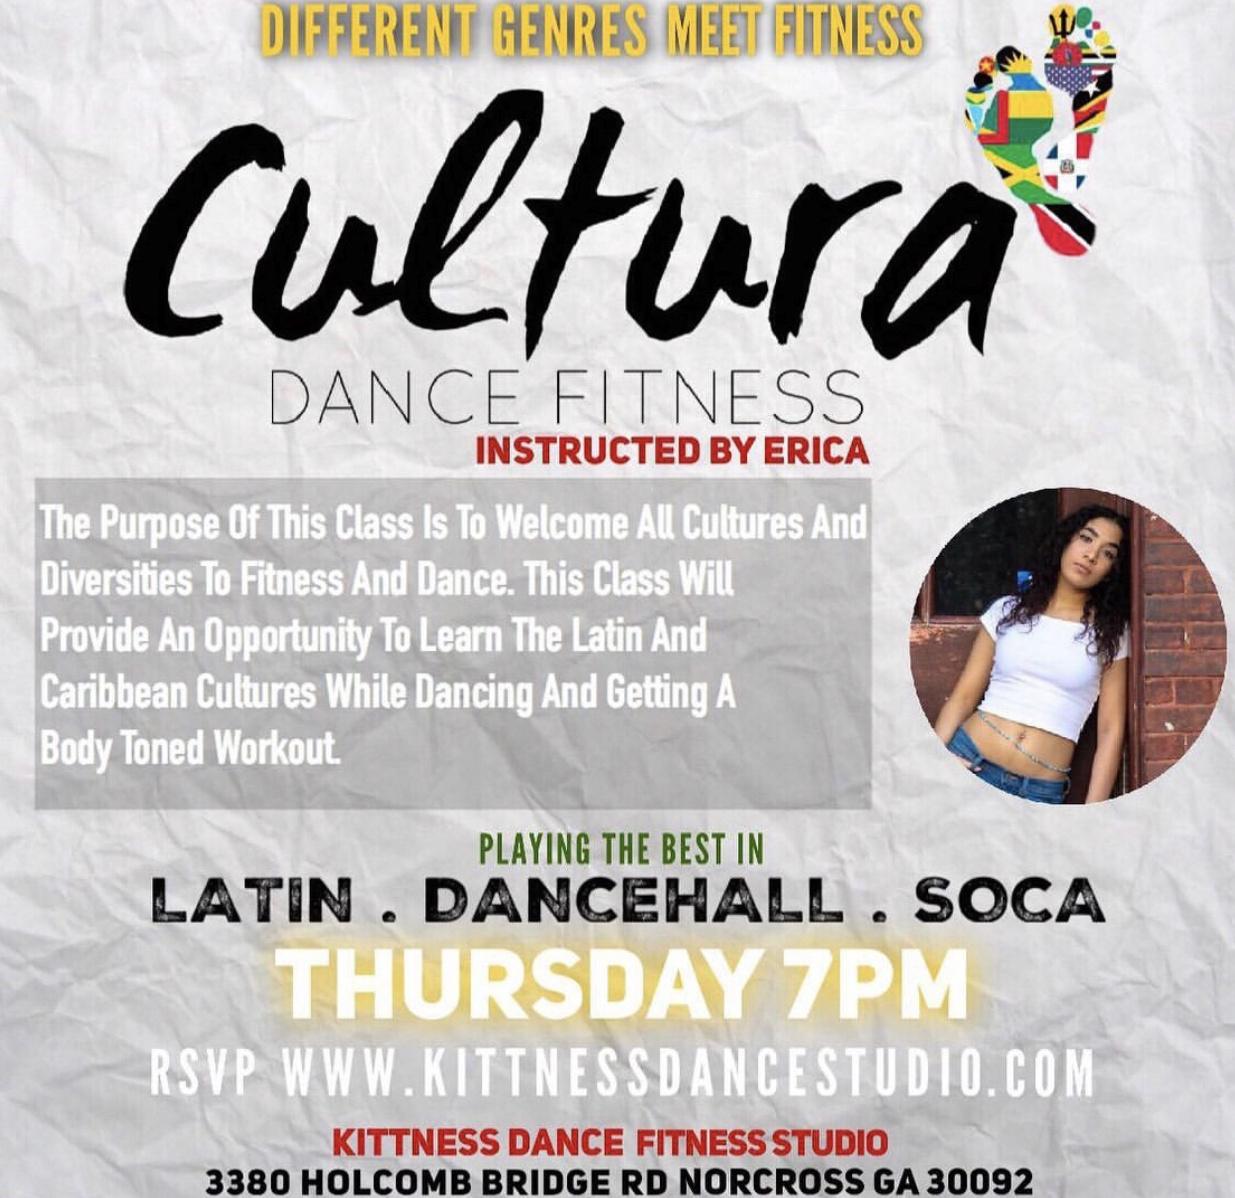 CULTURA DANCE FITNESS